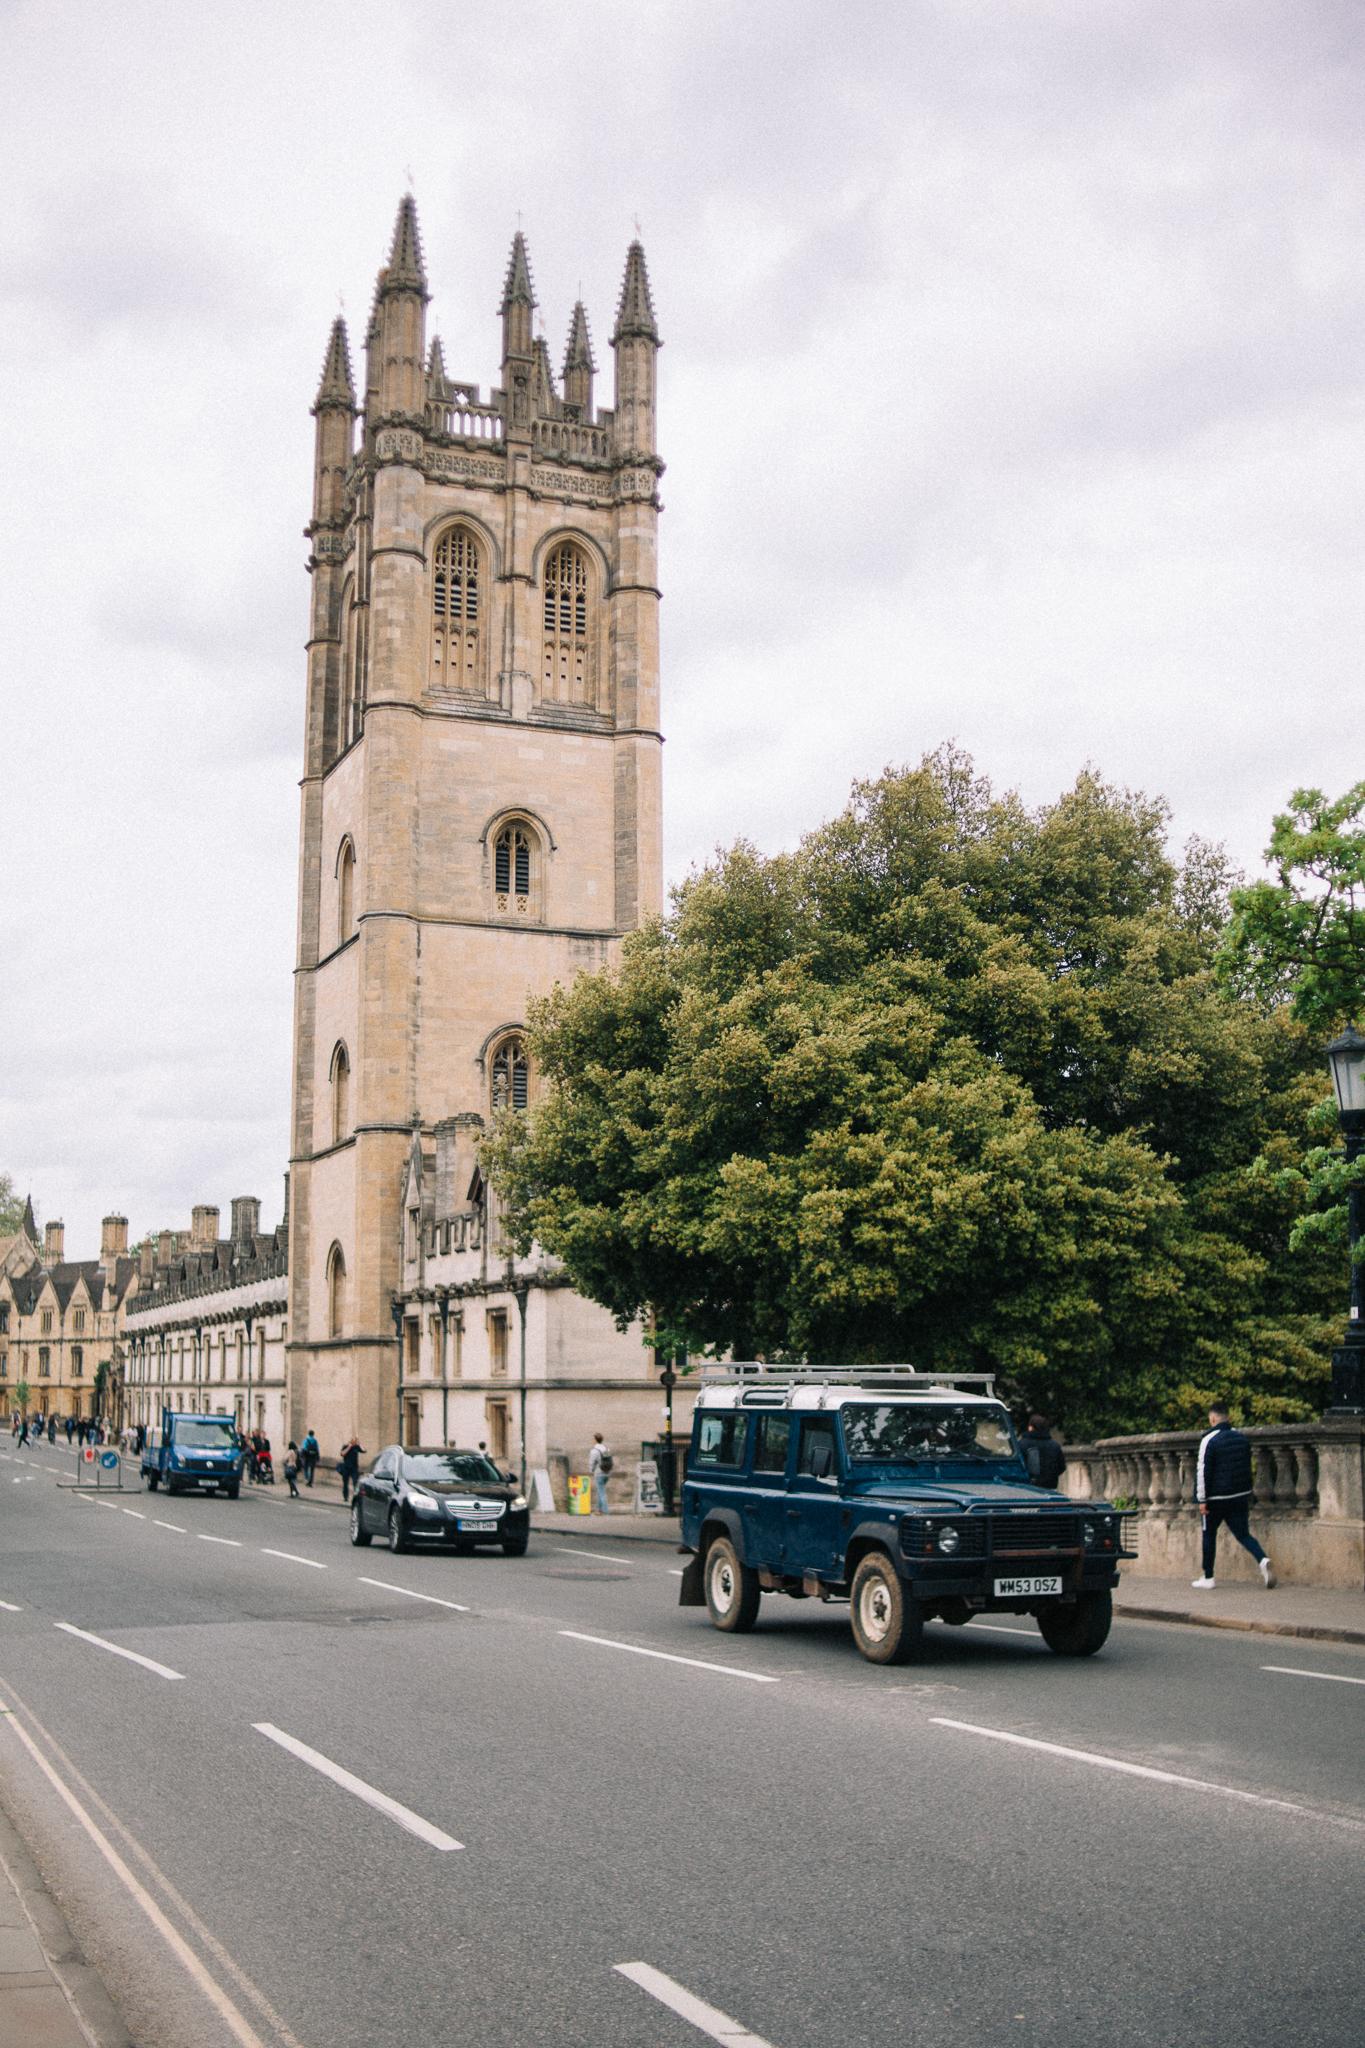 Oxford_0005.jpg